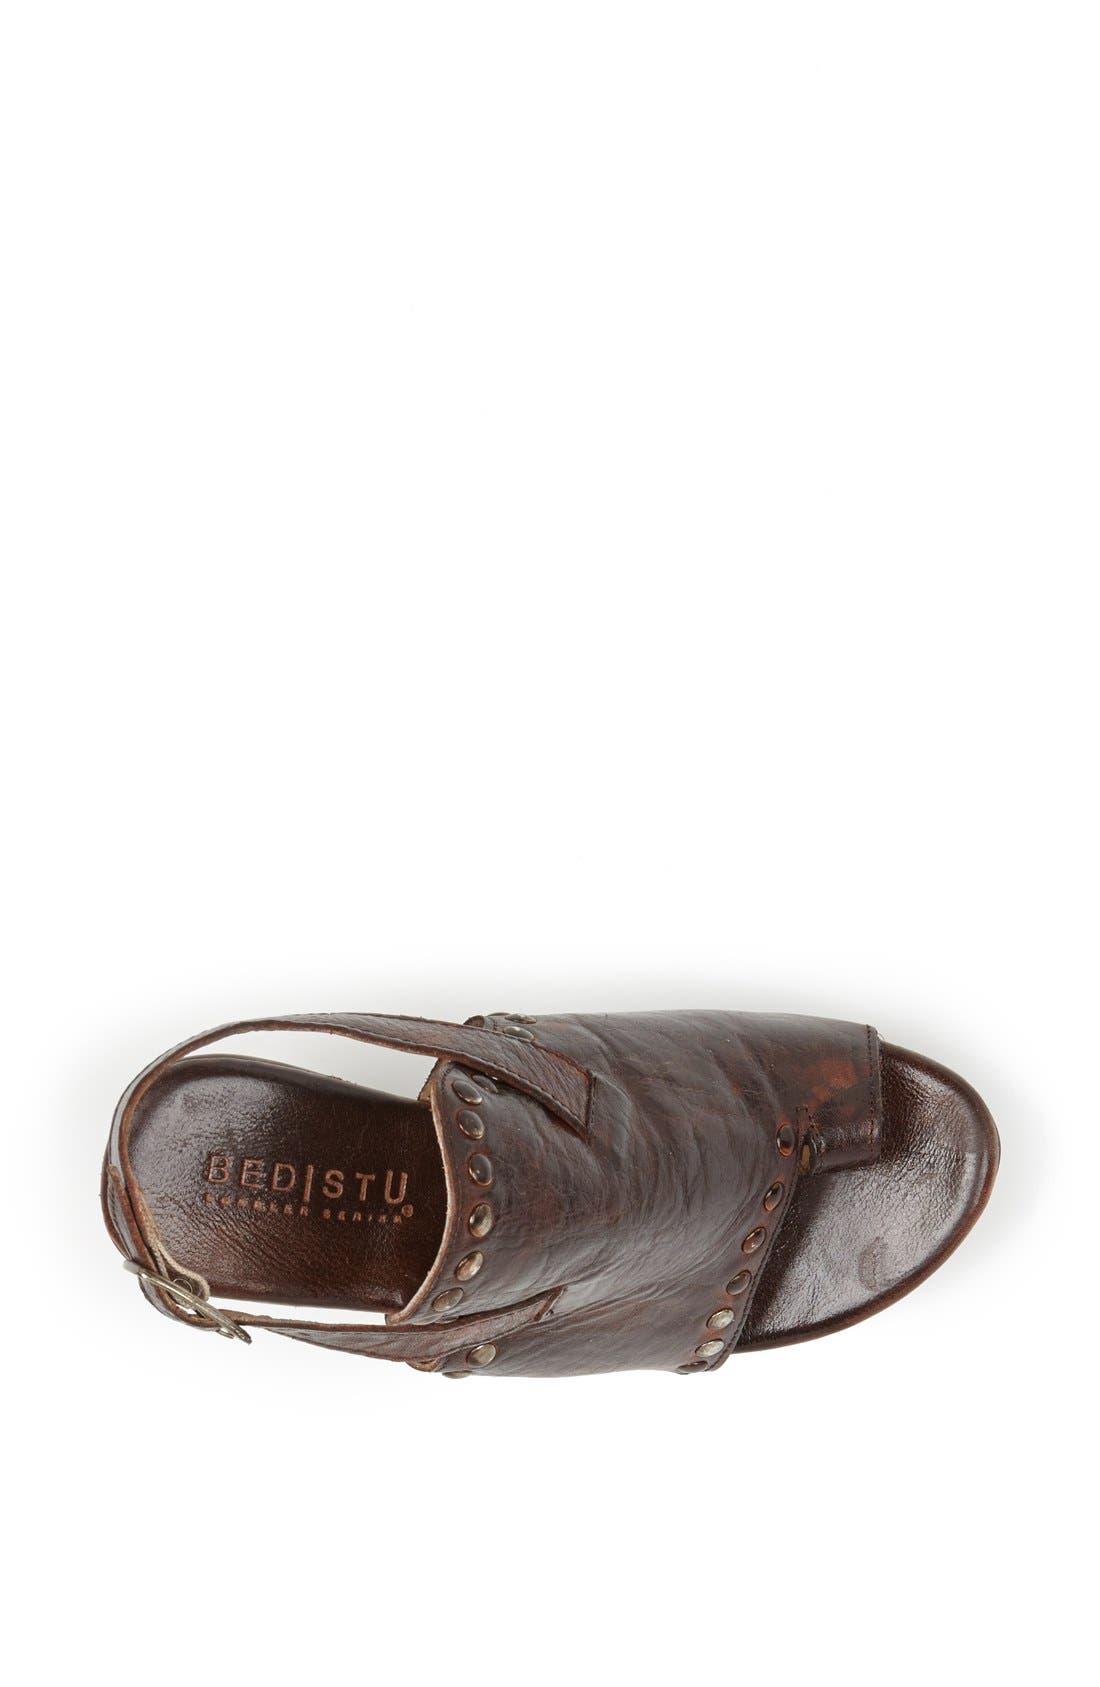 Alternate Image 2  - Bed Stu 'Joann' Leather Sandal